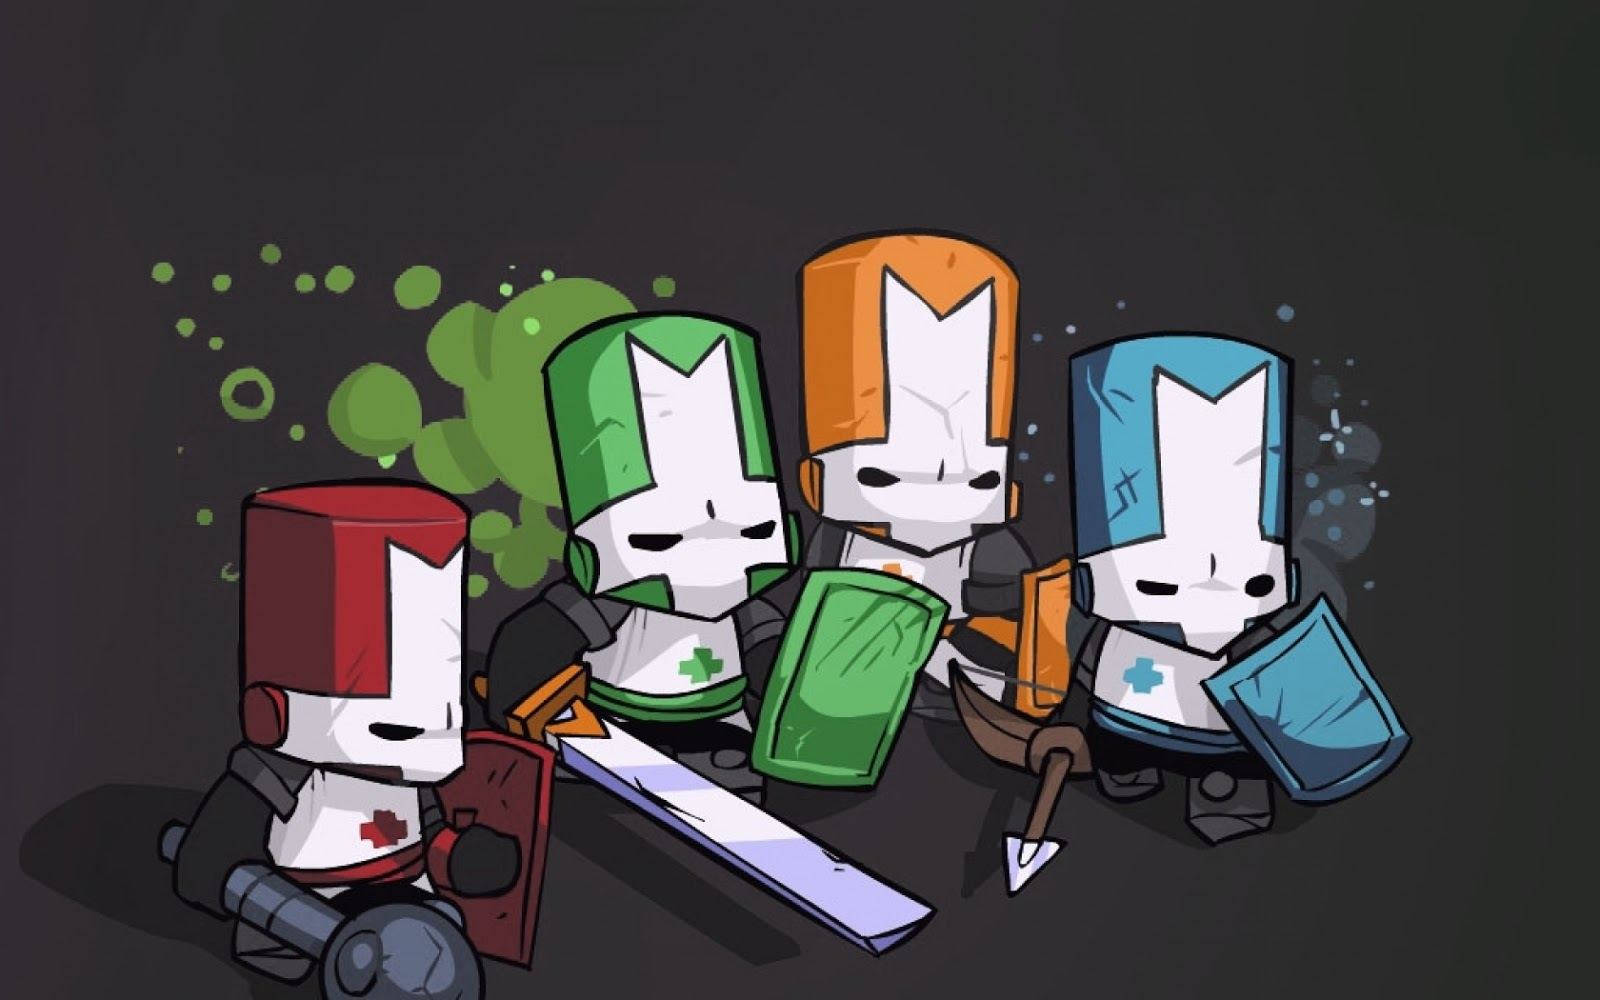 http://1.bp.blogspot.com/-Vftfk-Ykr6w/UQiBA987-MI/AAAAAAAABVM/WW6YUzJ4Ie8/s1600/video_games_castle_crashers_1024x768_wallpaper_Wallpaper_1680x1050_www.wallpaperswa.com.jpg